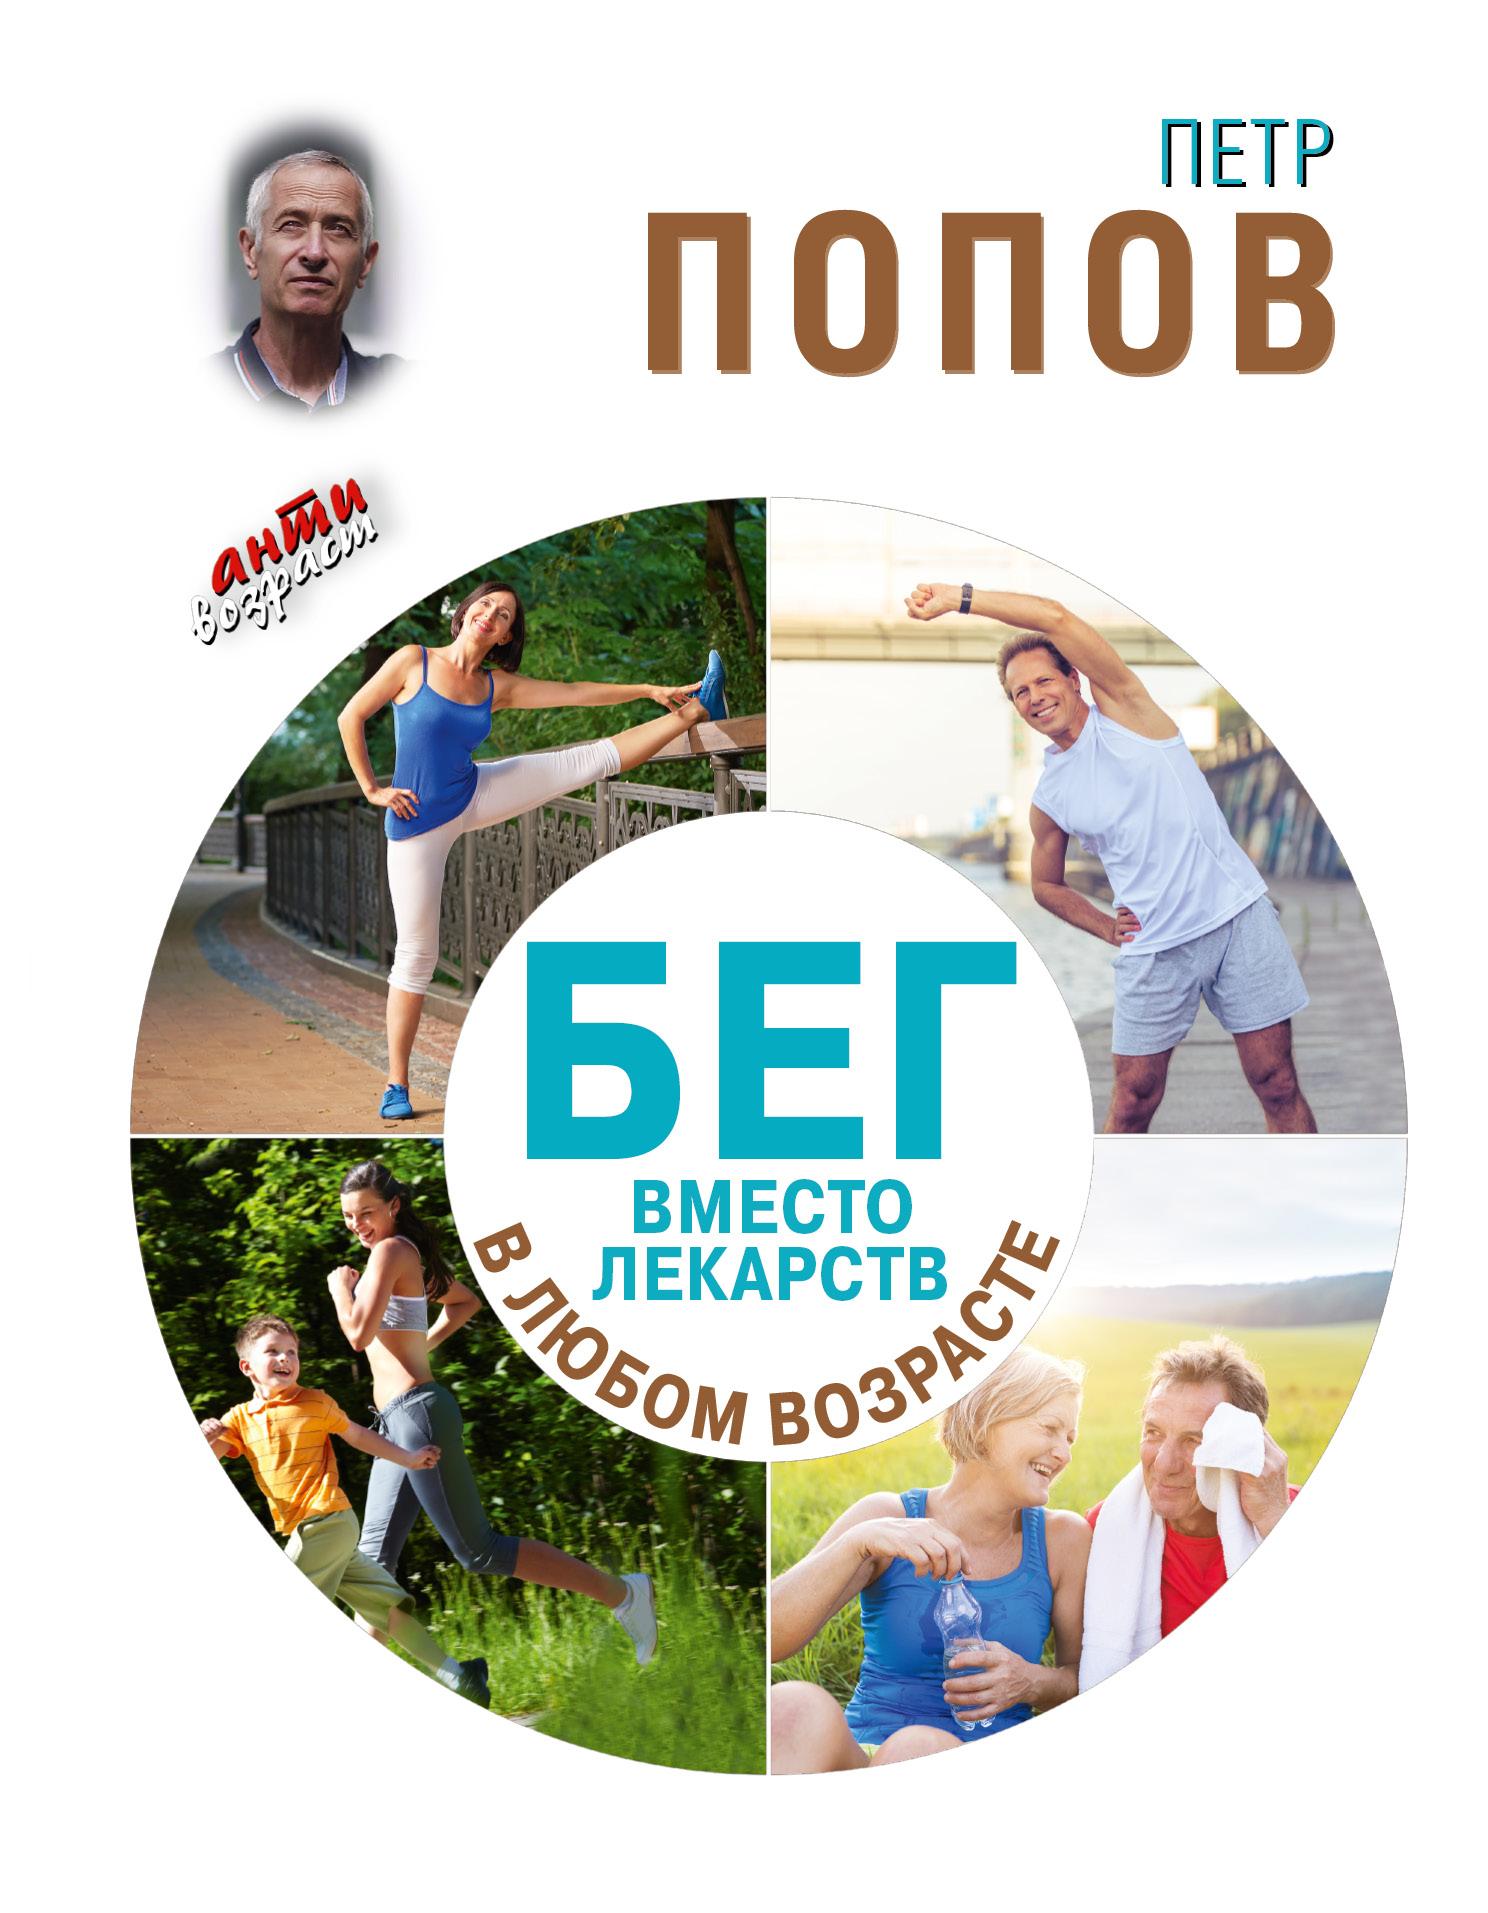 Попов Петр Александрович Бег вместо лекарств в любом возрасте